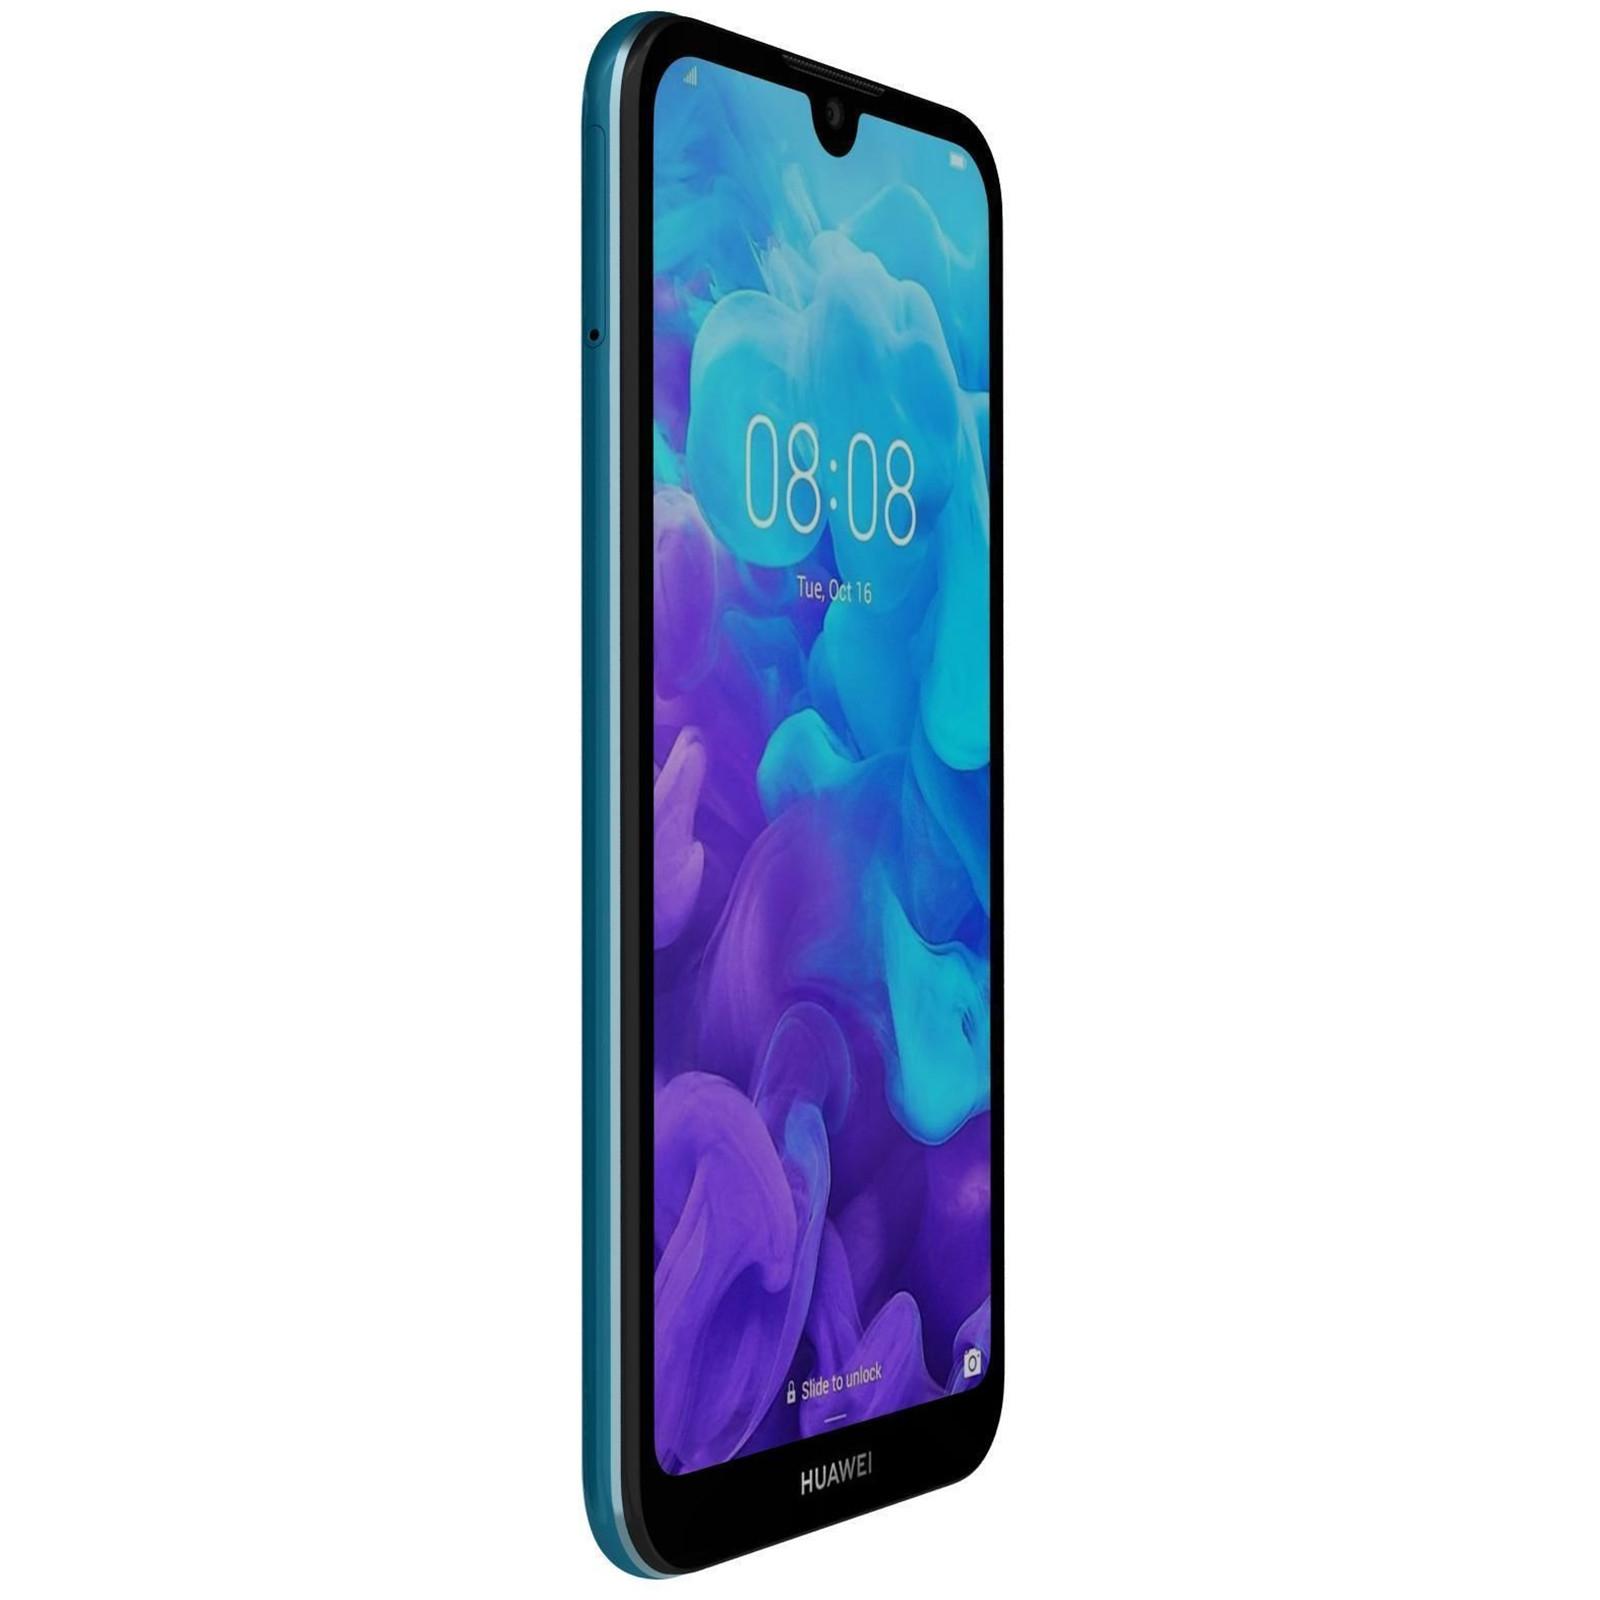 Buy the Huawei Y5 2019 Smartphone 32GB - Sapphire Blue